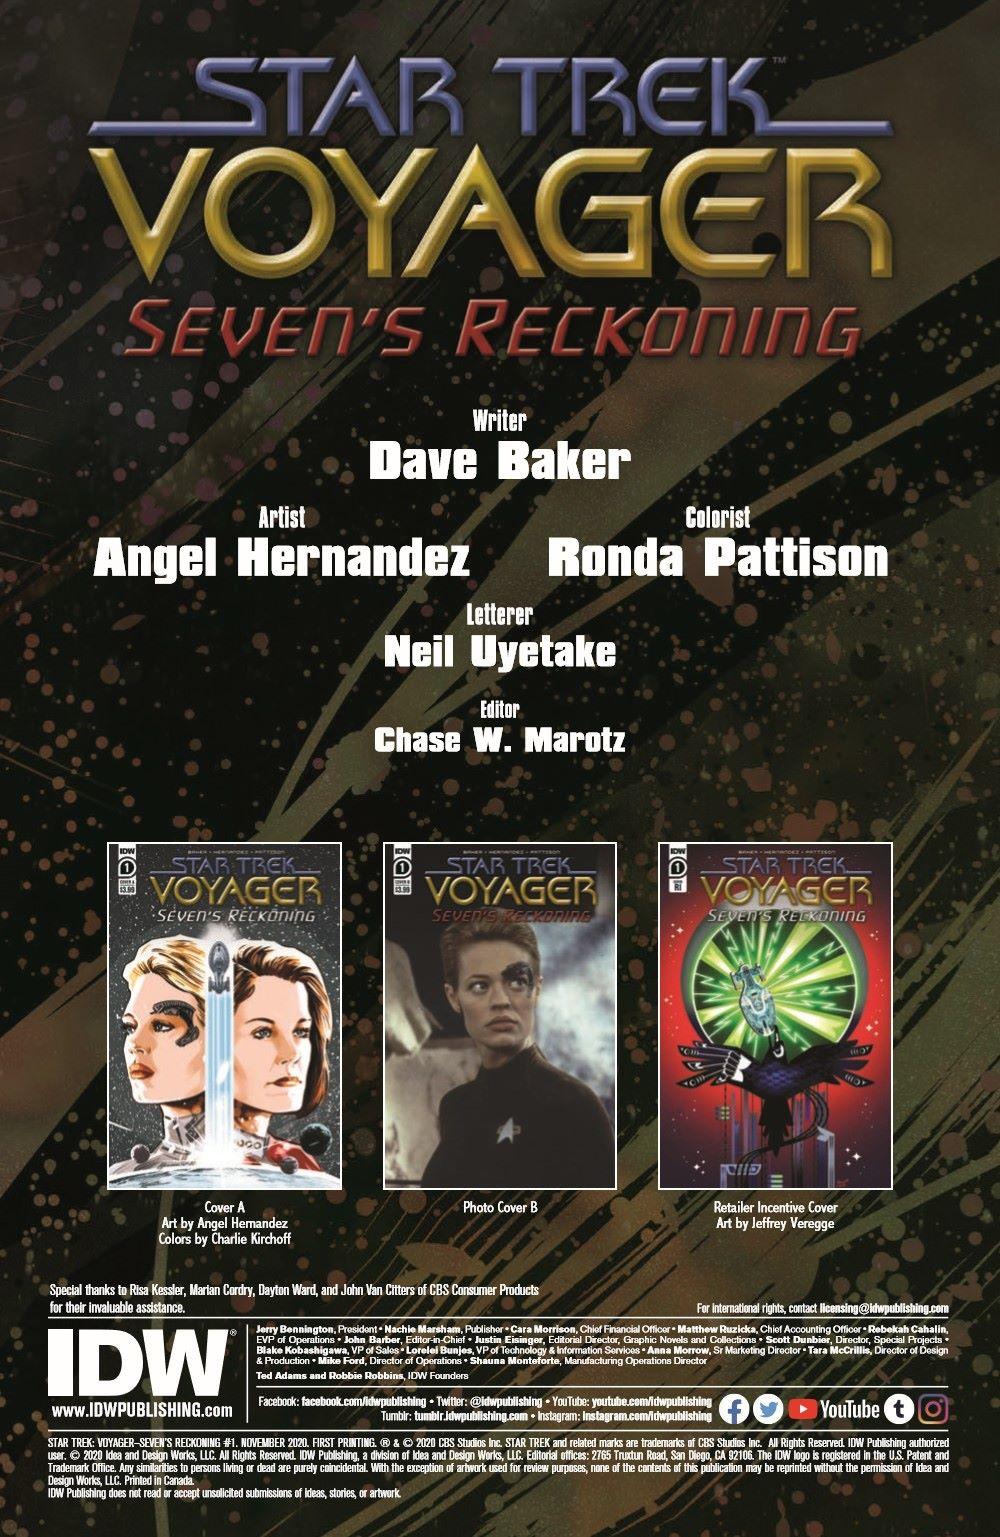 ST_Voyager_SR01-pr-2 ComicList Previews: STAR TREK VOYAGER SEVEN'S RECKONING #1 (OF 4)